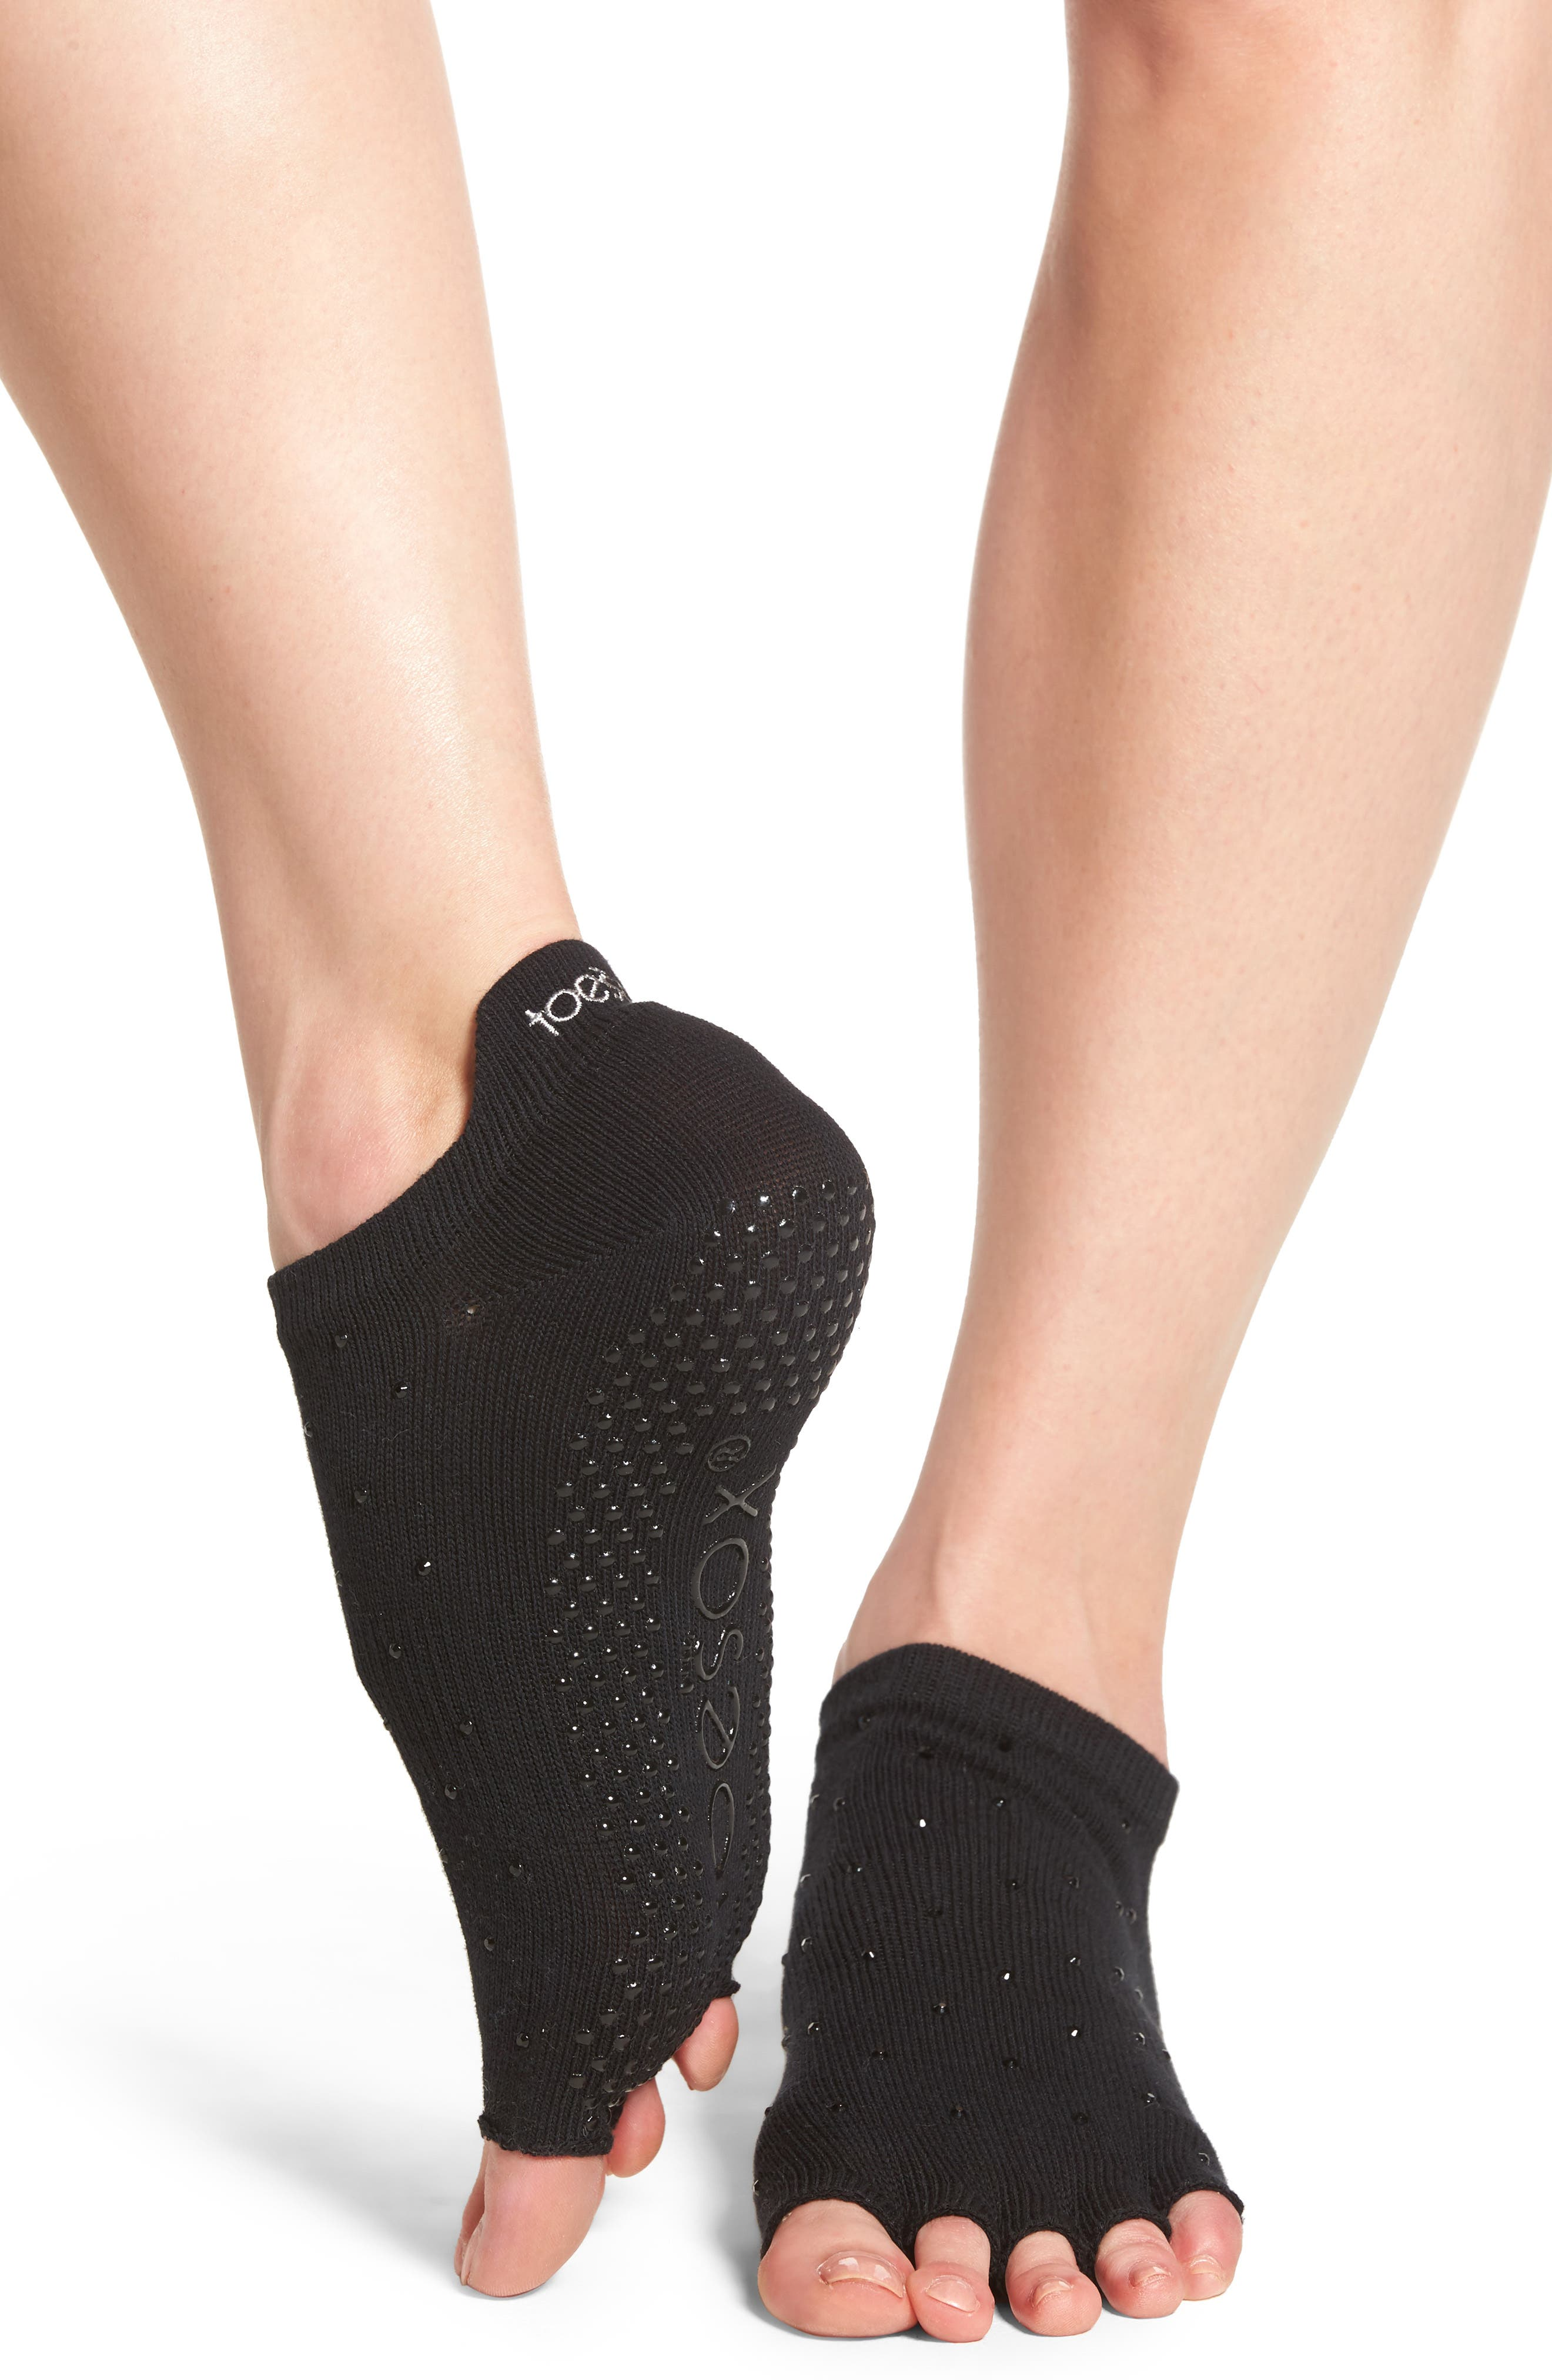 Half Toe Low Rise Grip Socks,                             Alternate thumbnail 2, color,                             Nightlife